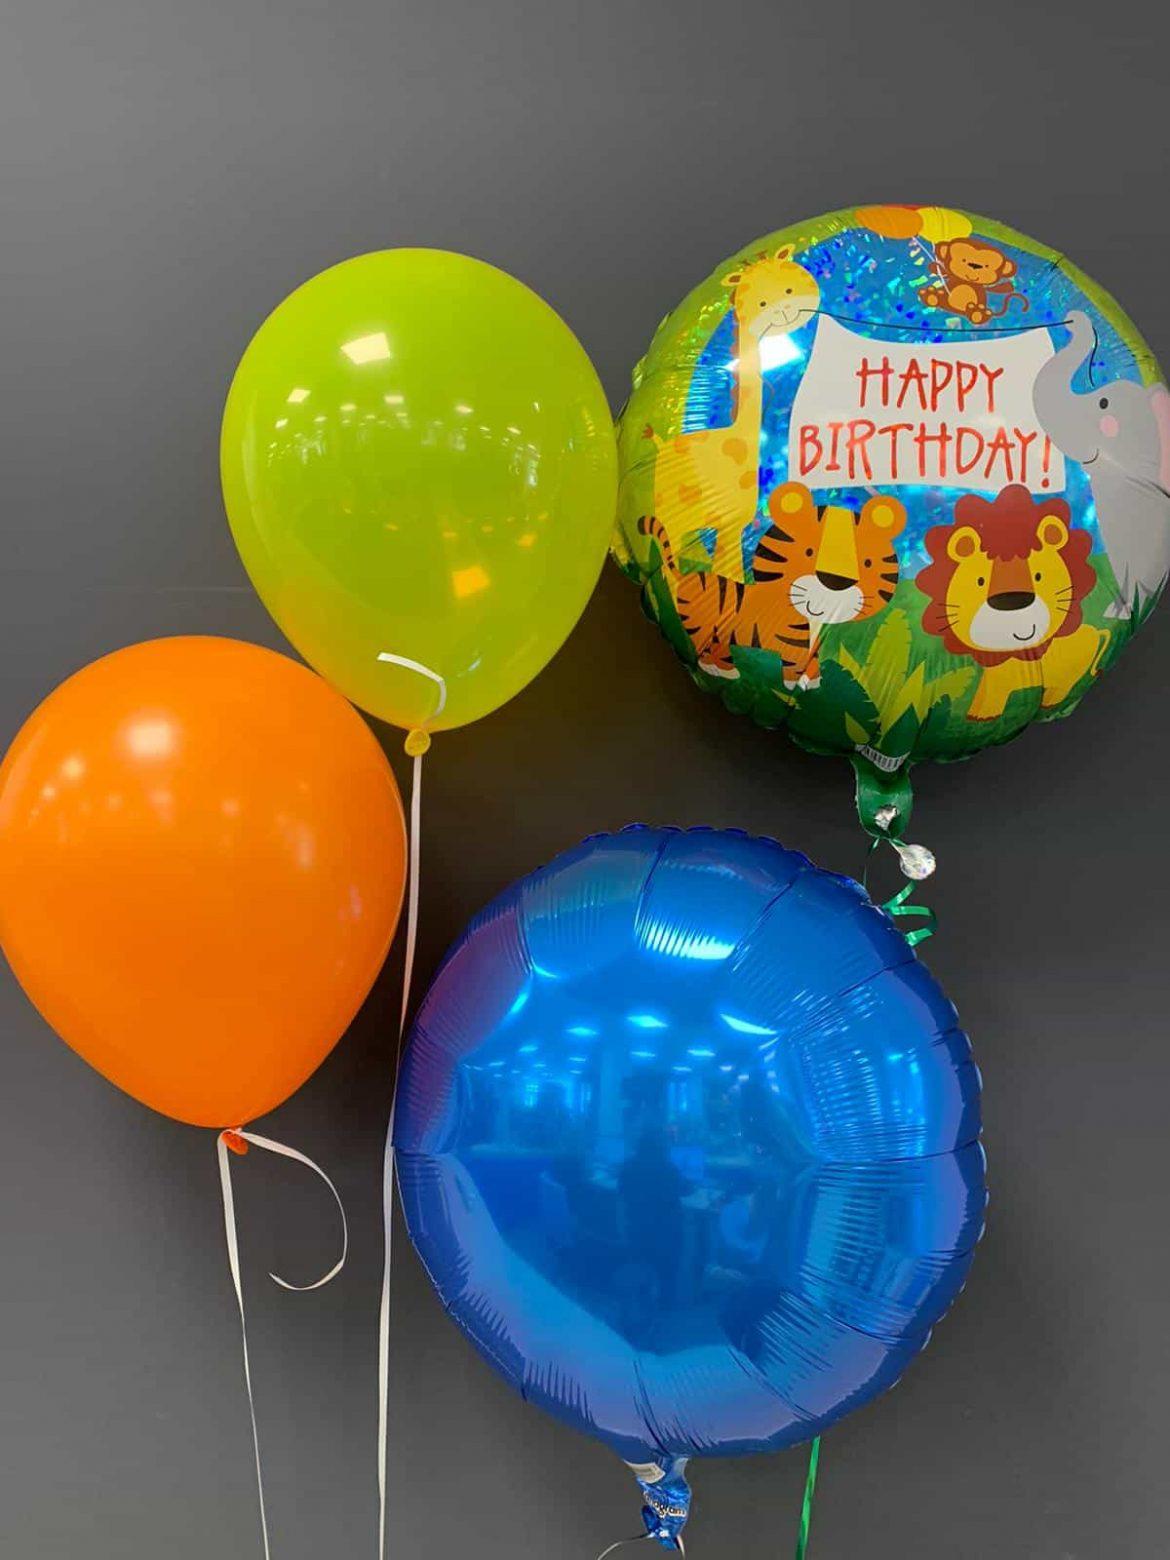 Happy Birthday €5,50<br />Dekoballon €4,50<br />Latexballons €1,95 1